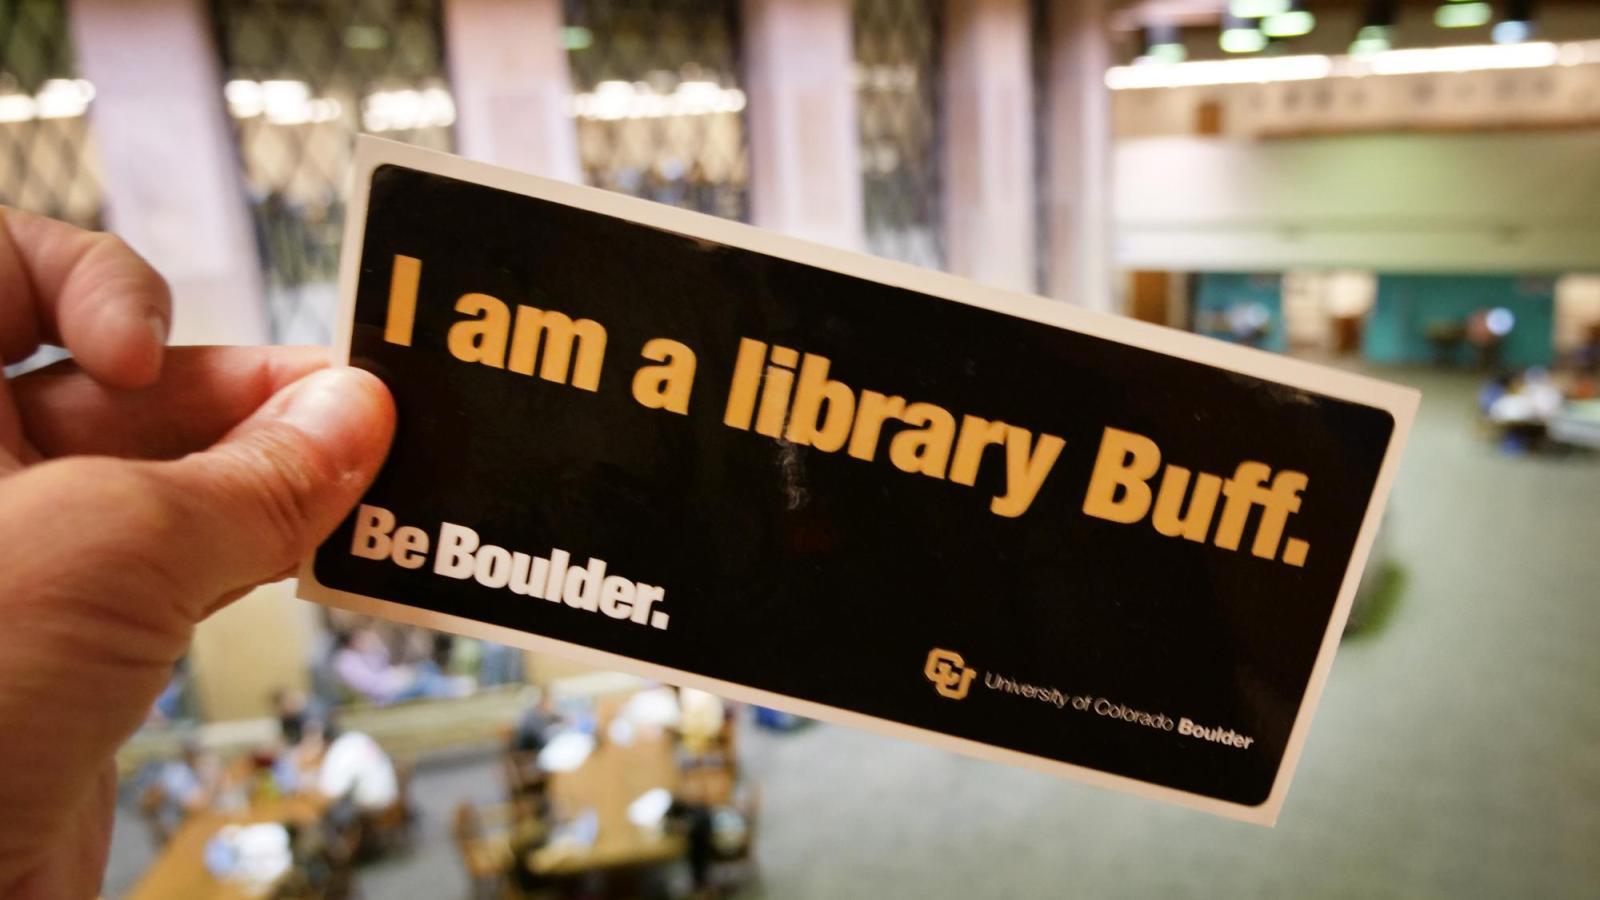 I am a library Buff sticker